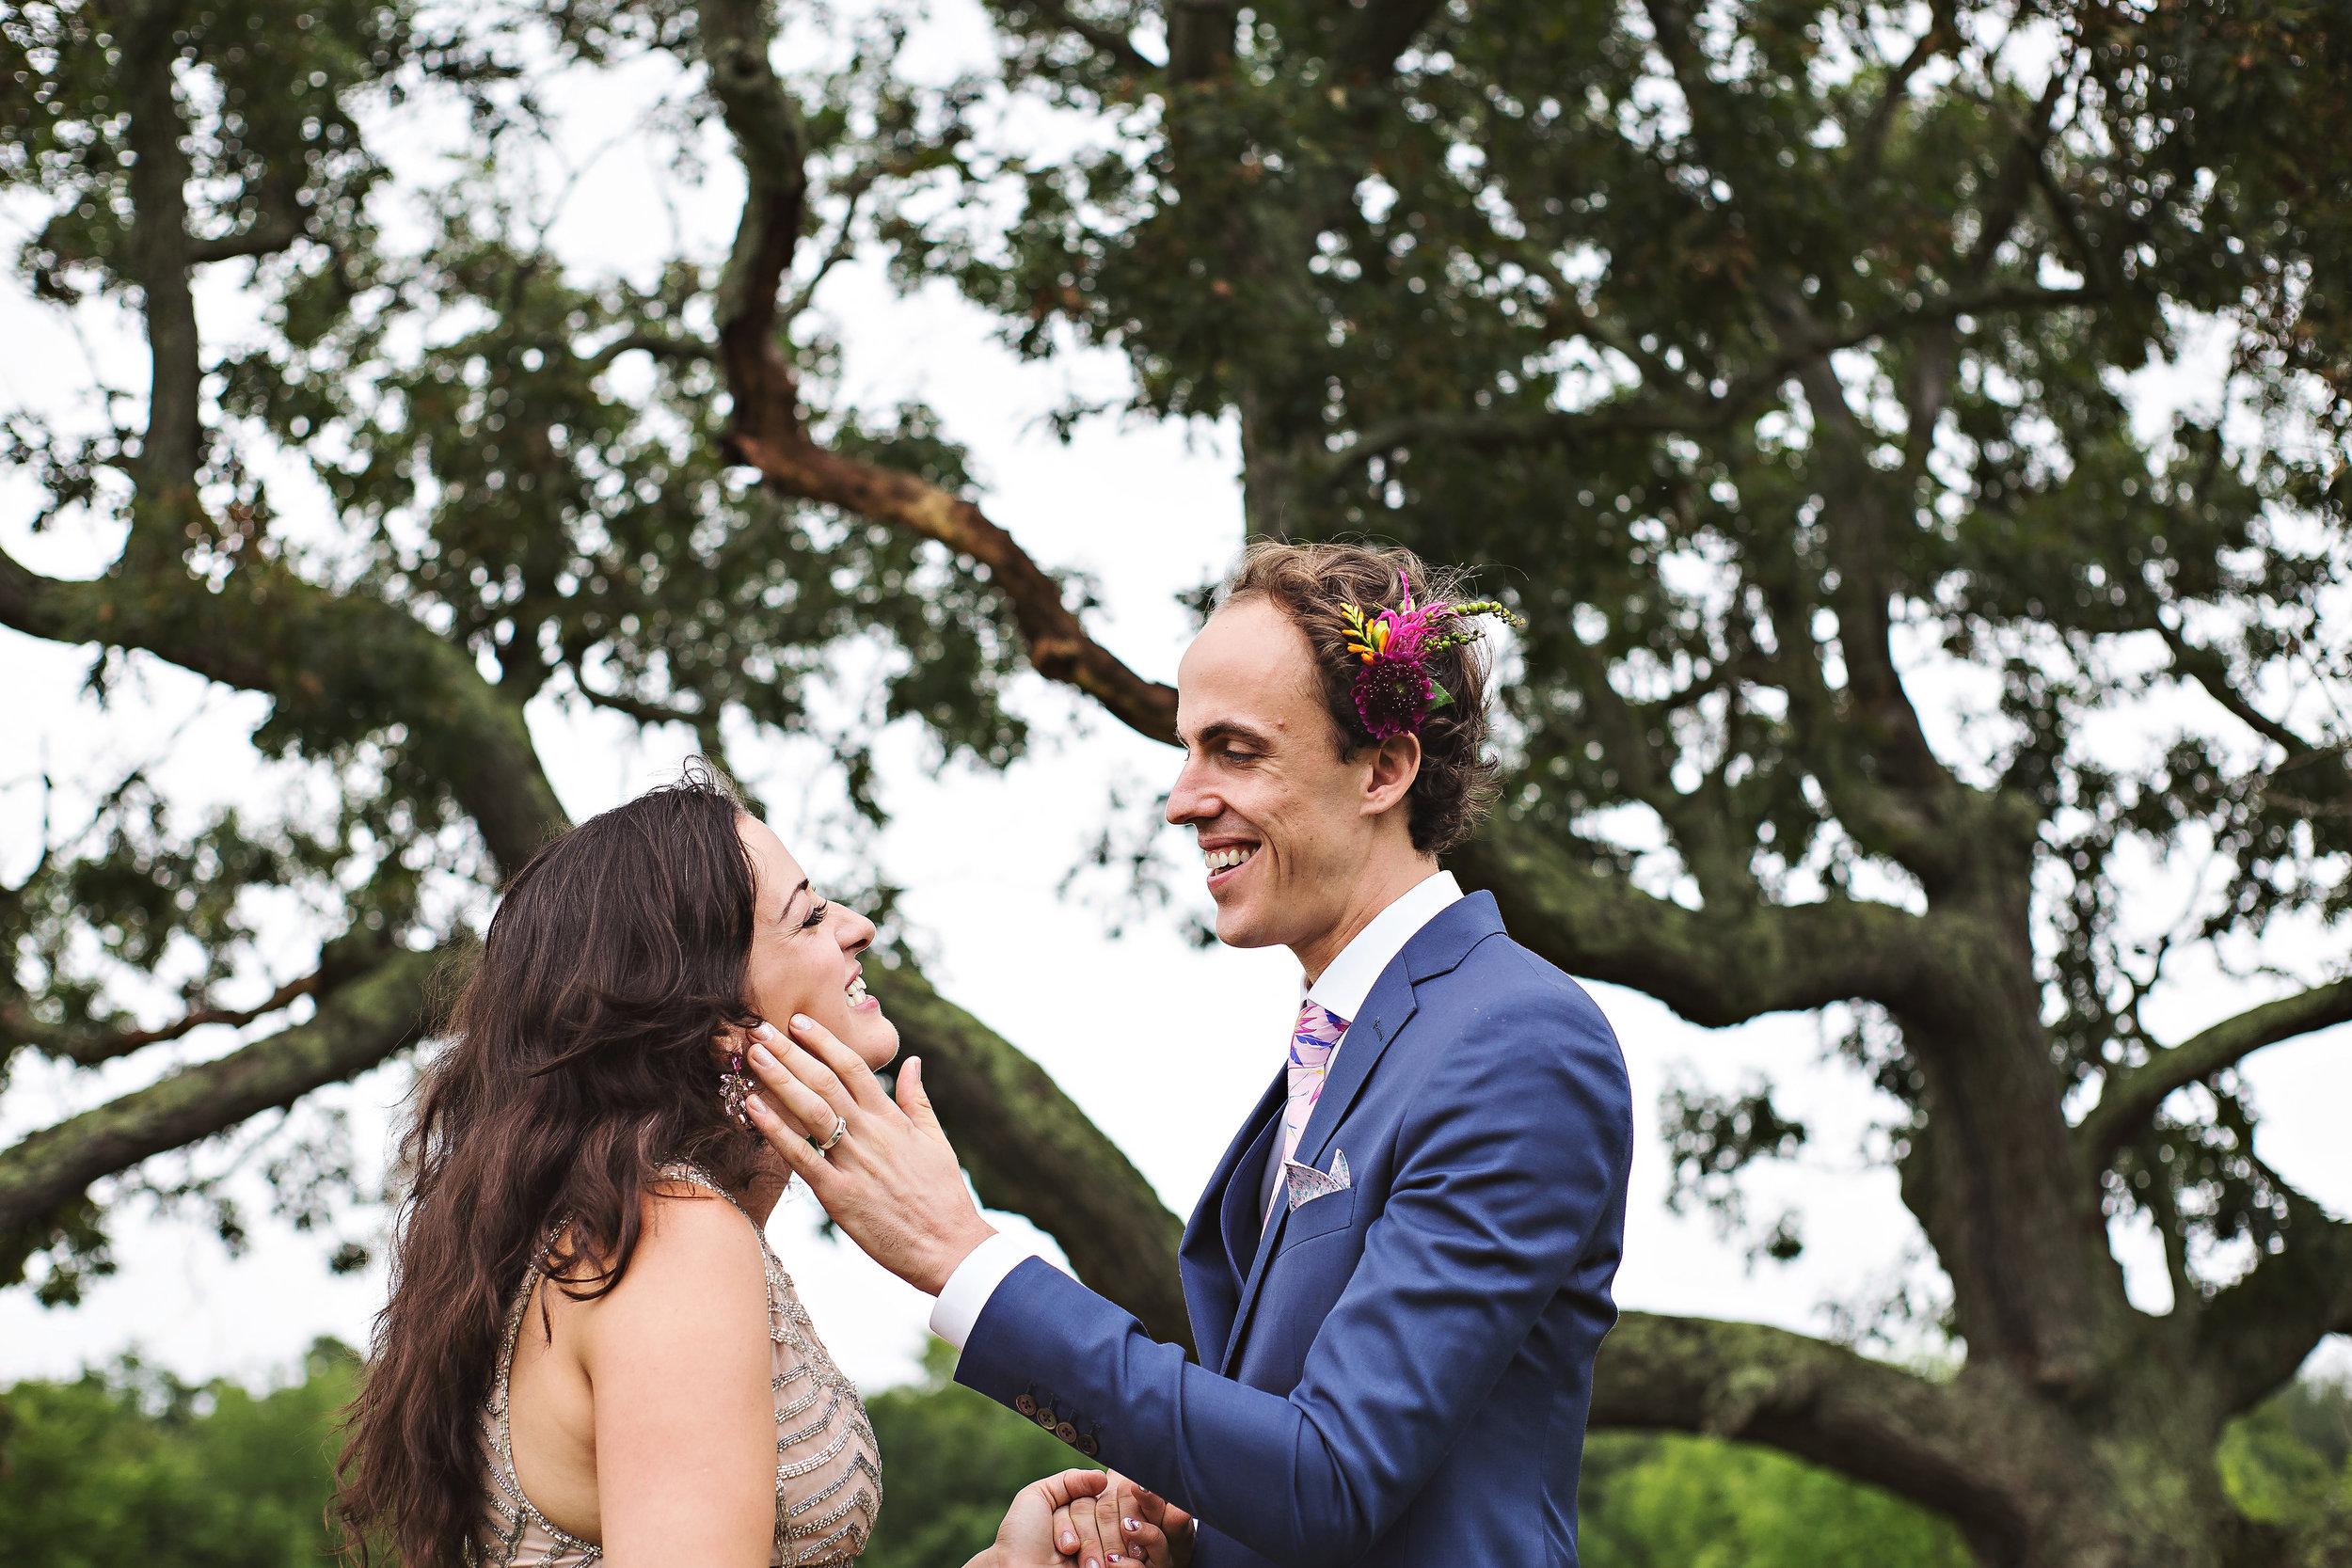 upstate-ny-wedding-jove-meyer-events-inbal-sivan-069.jpg